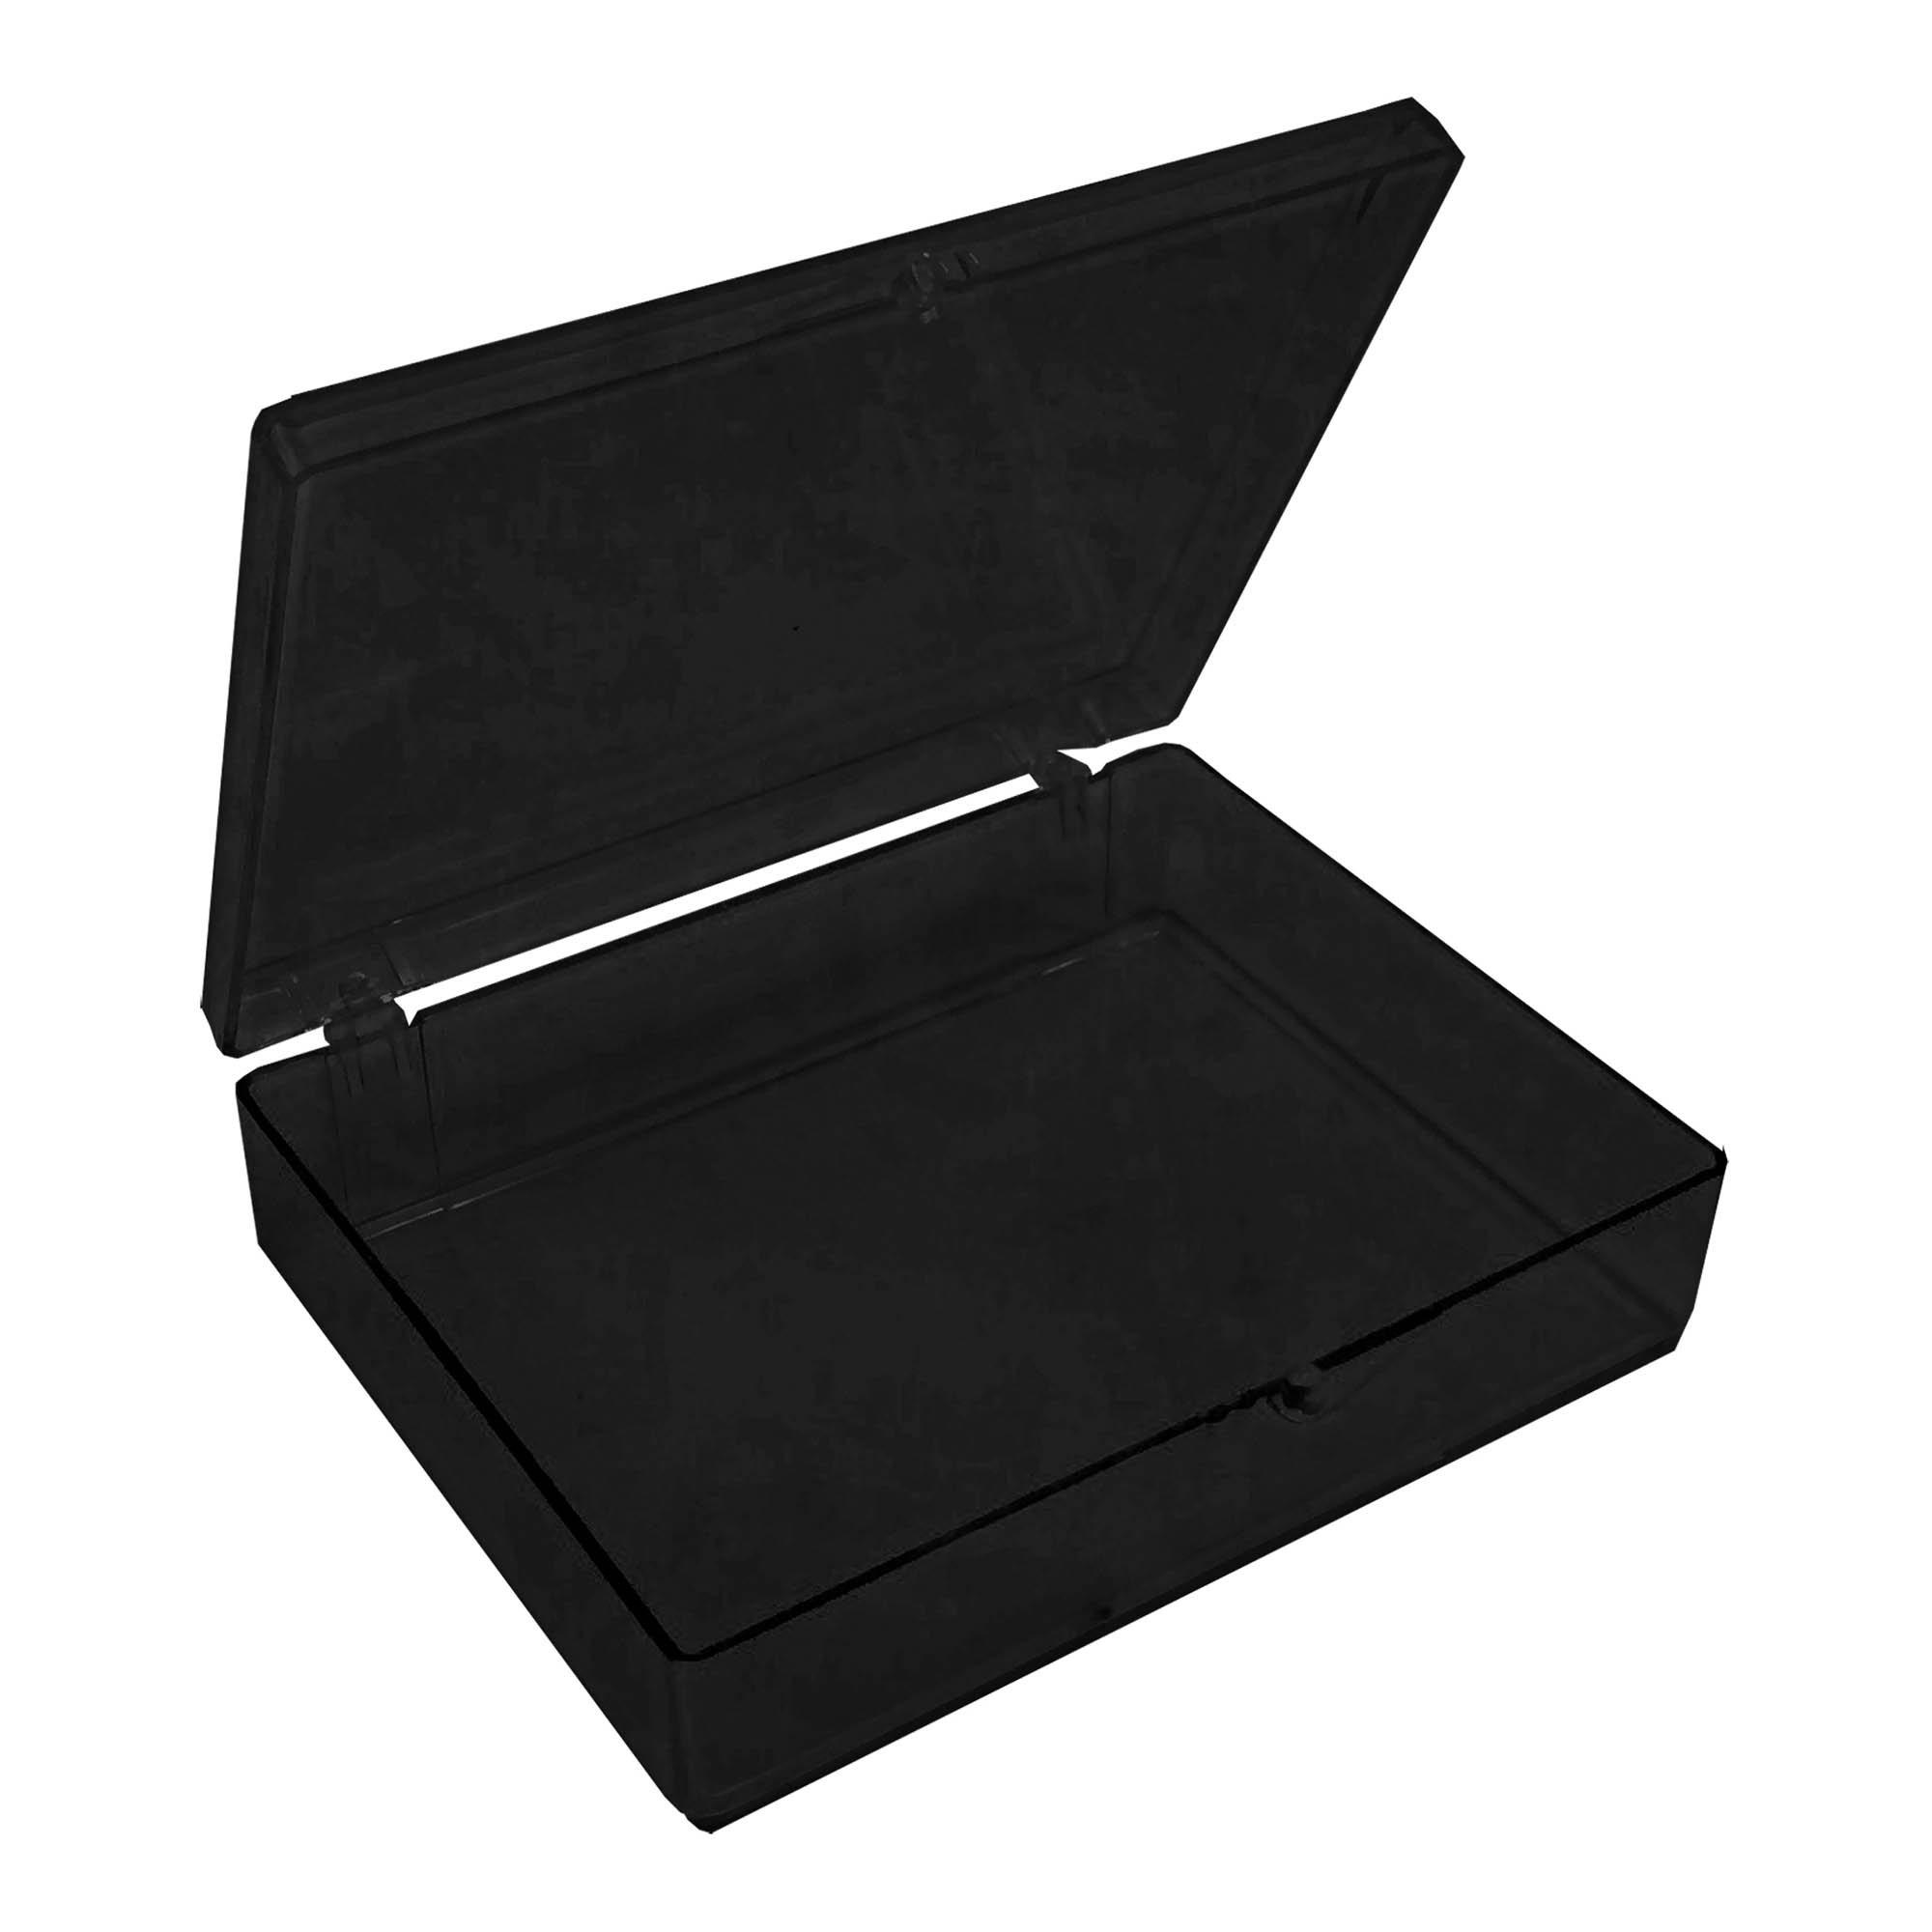 Large Opaque Black Western Blot Box - 4 5/8